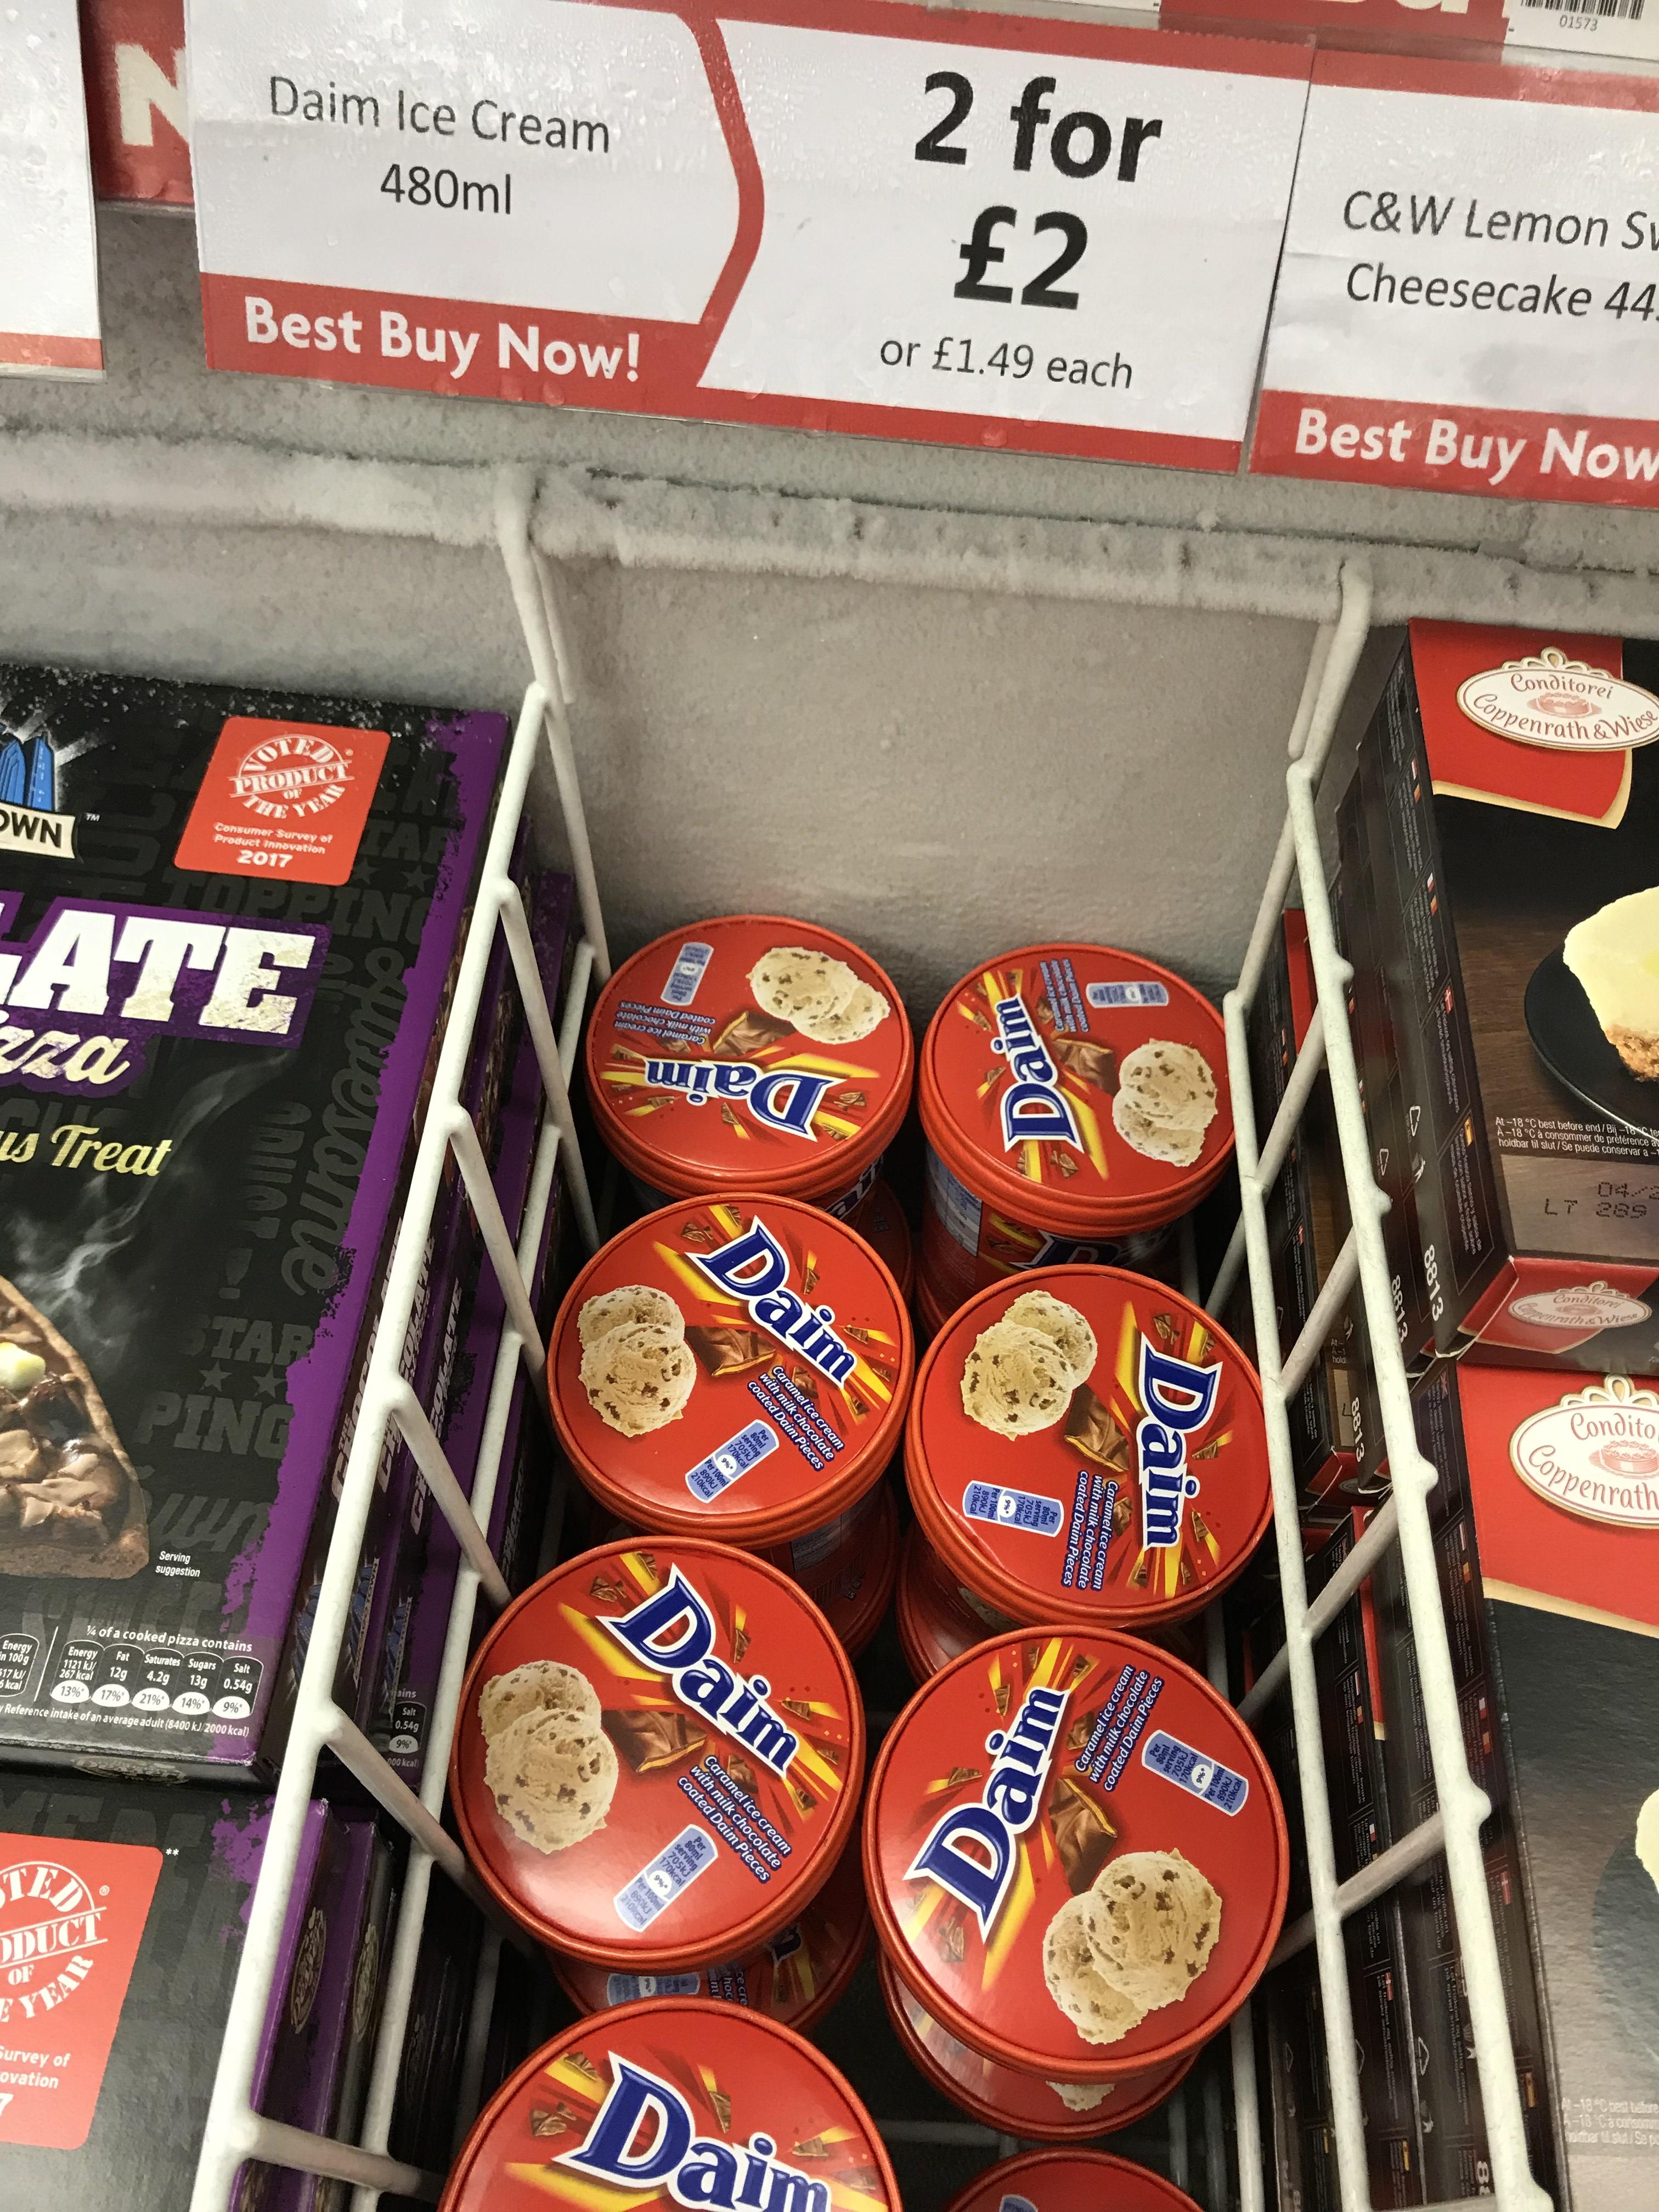 2 daim ice cream tubs for £2 - heron foods